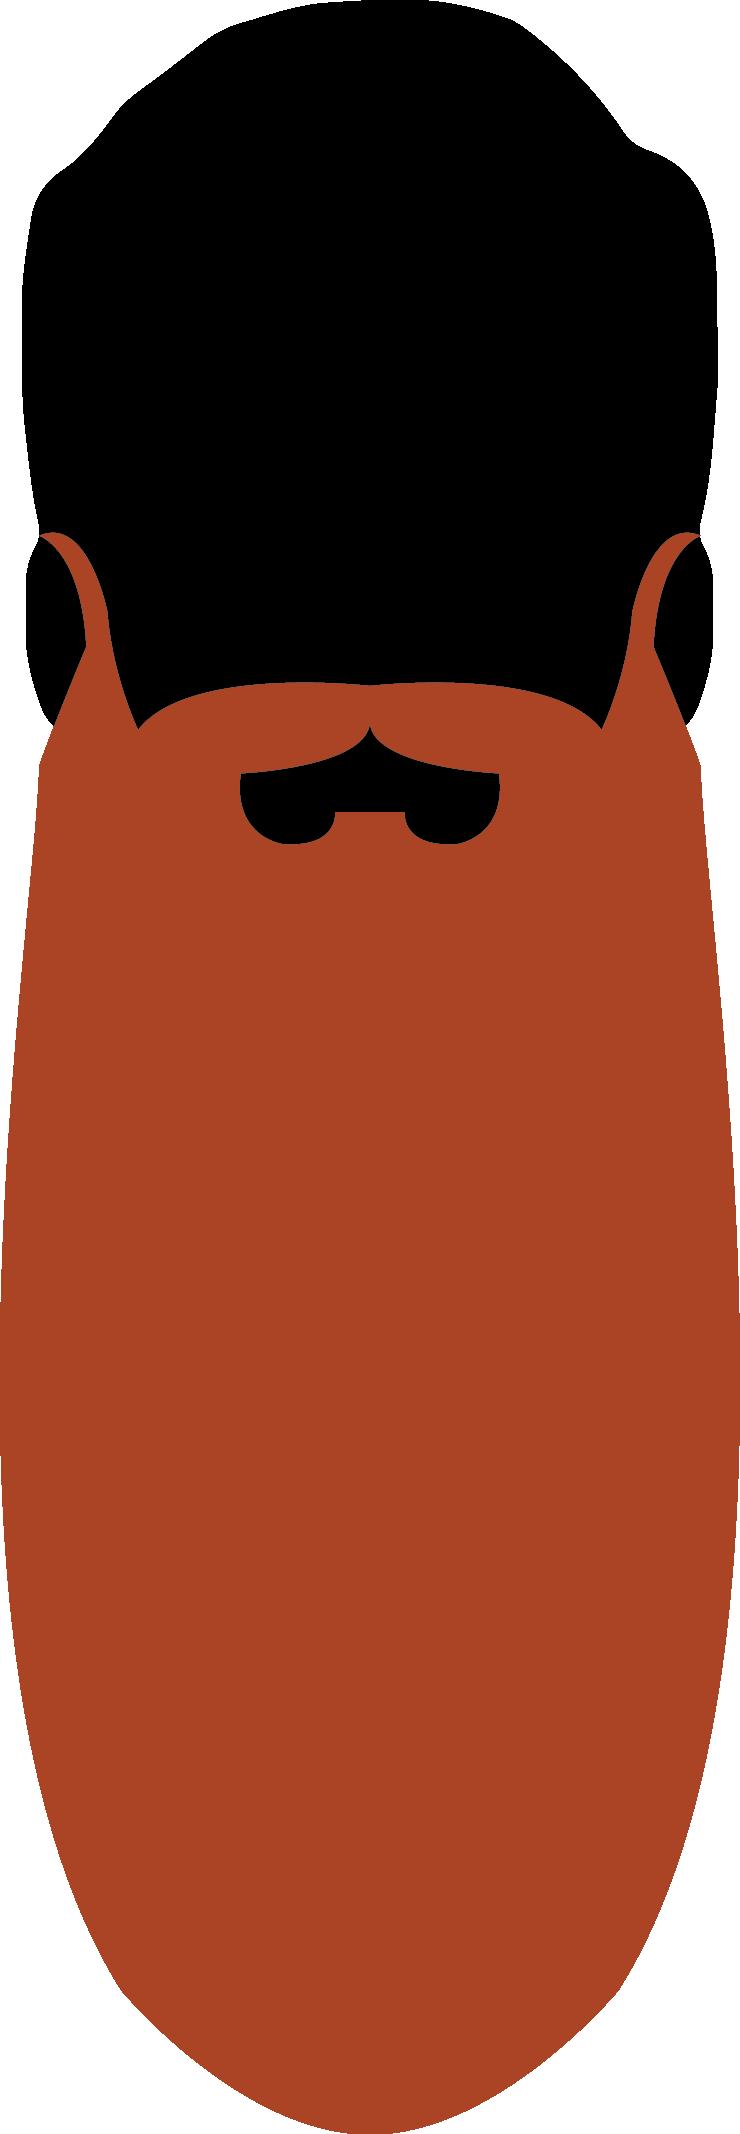 20. Natural Full Beard 60cm